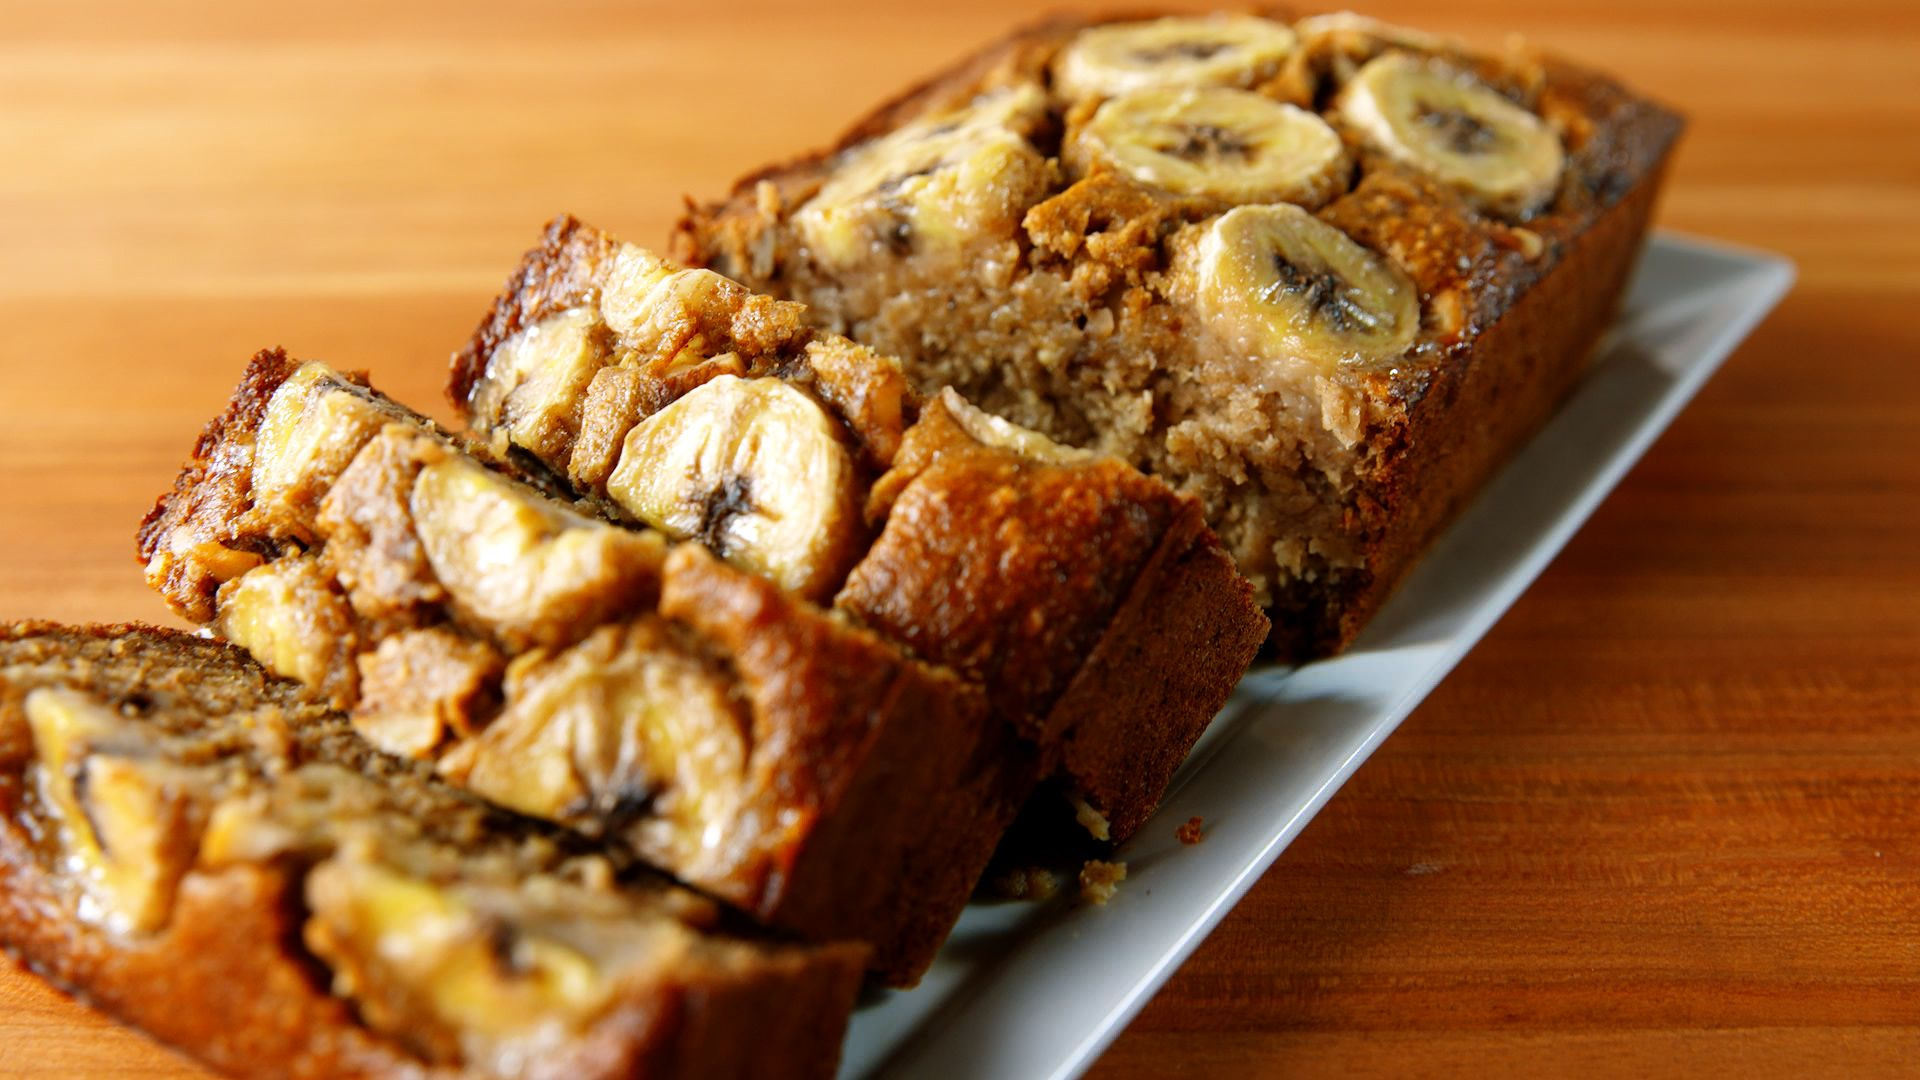 Best Gluten Free Banana Bread Recipe How To Make Gluten Free